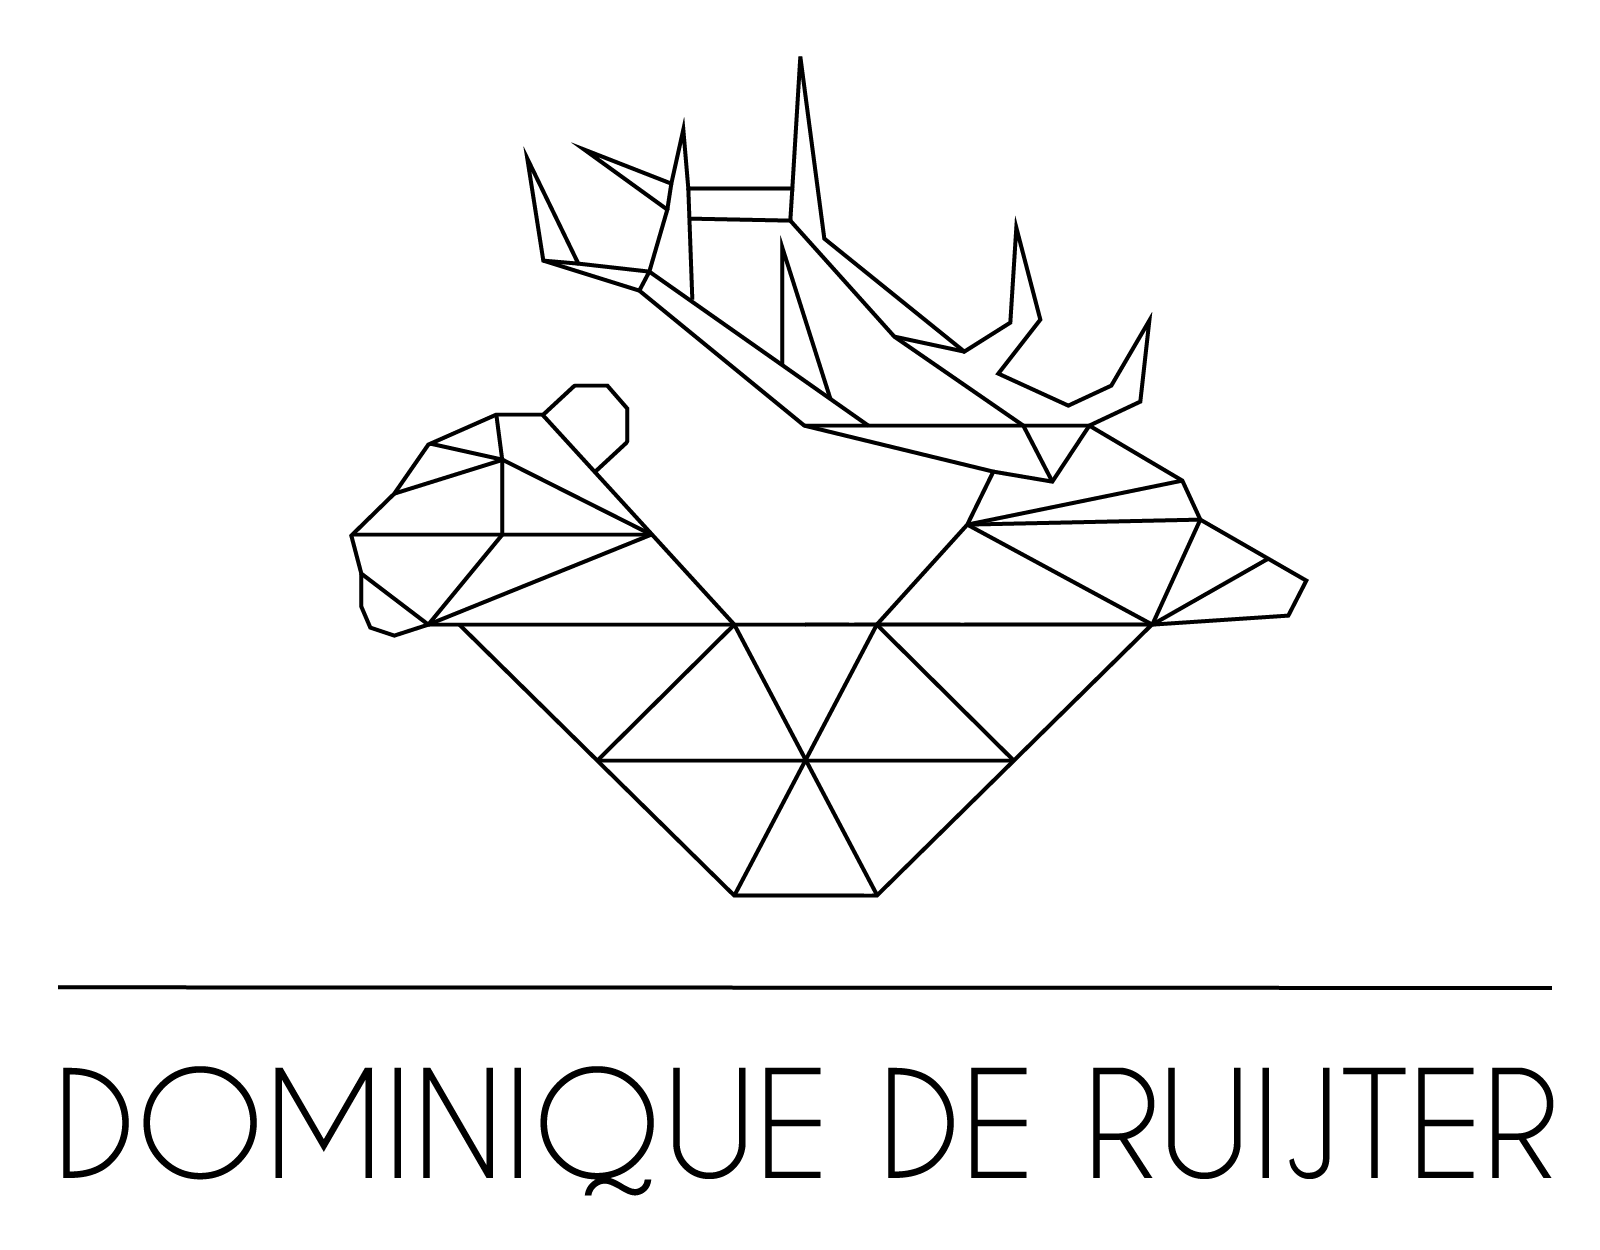 Logo_Dominique_De_Ruijter-01